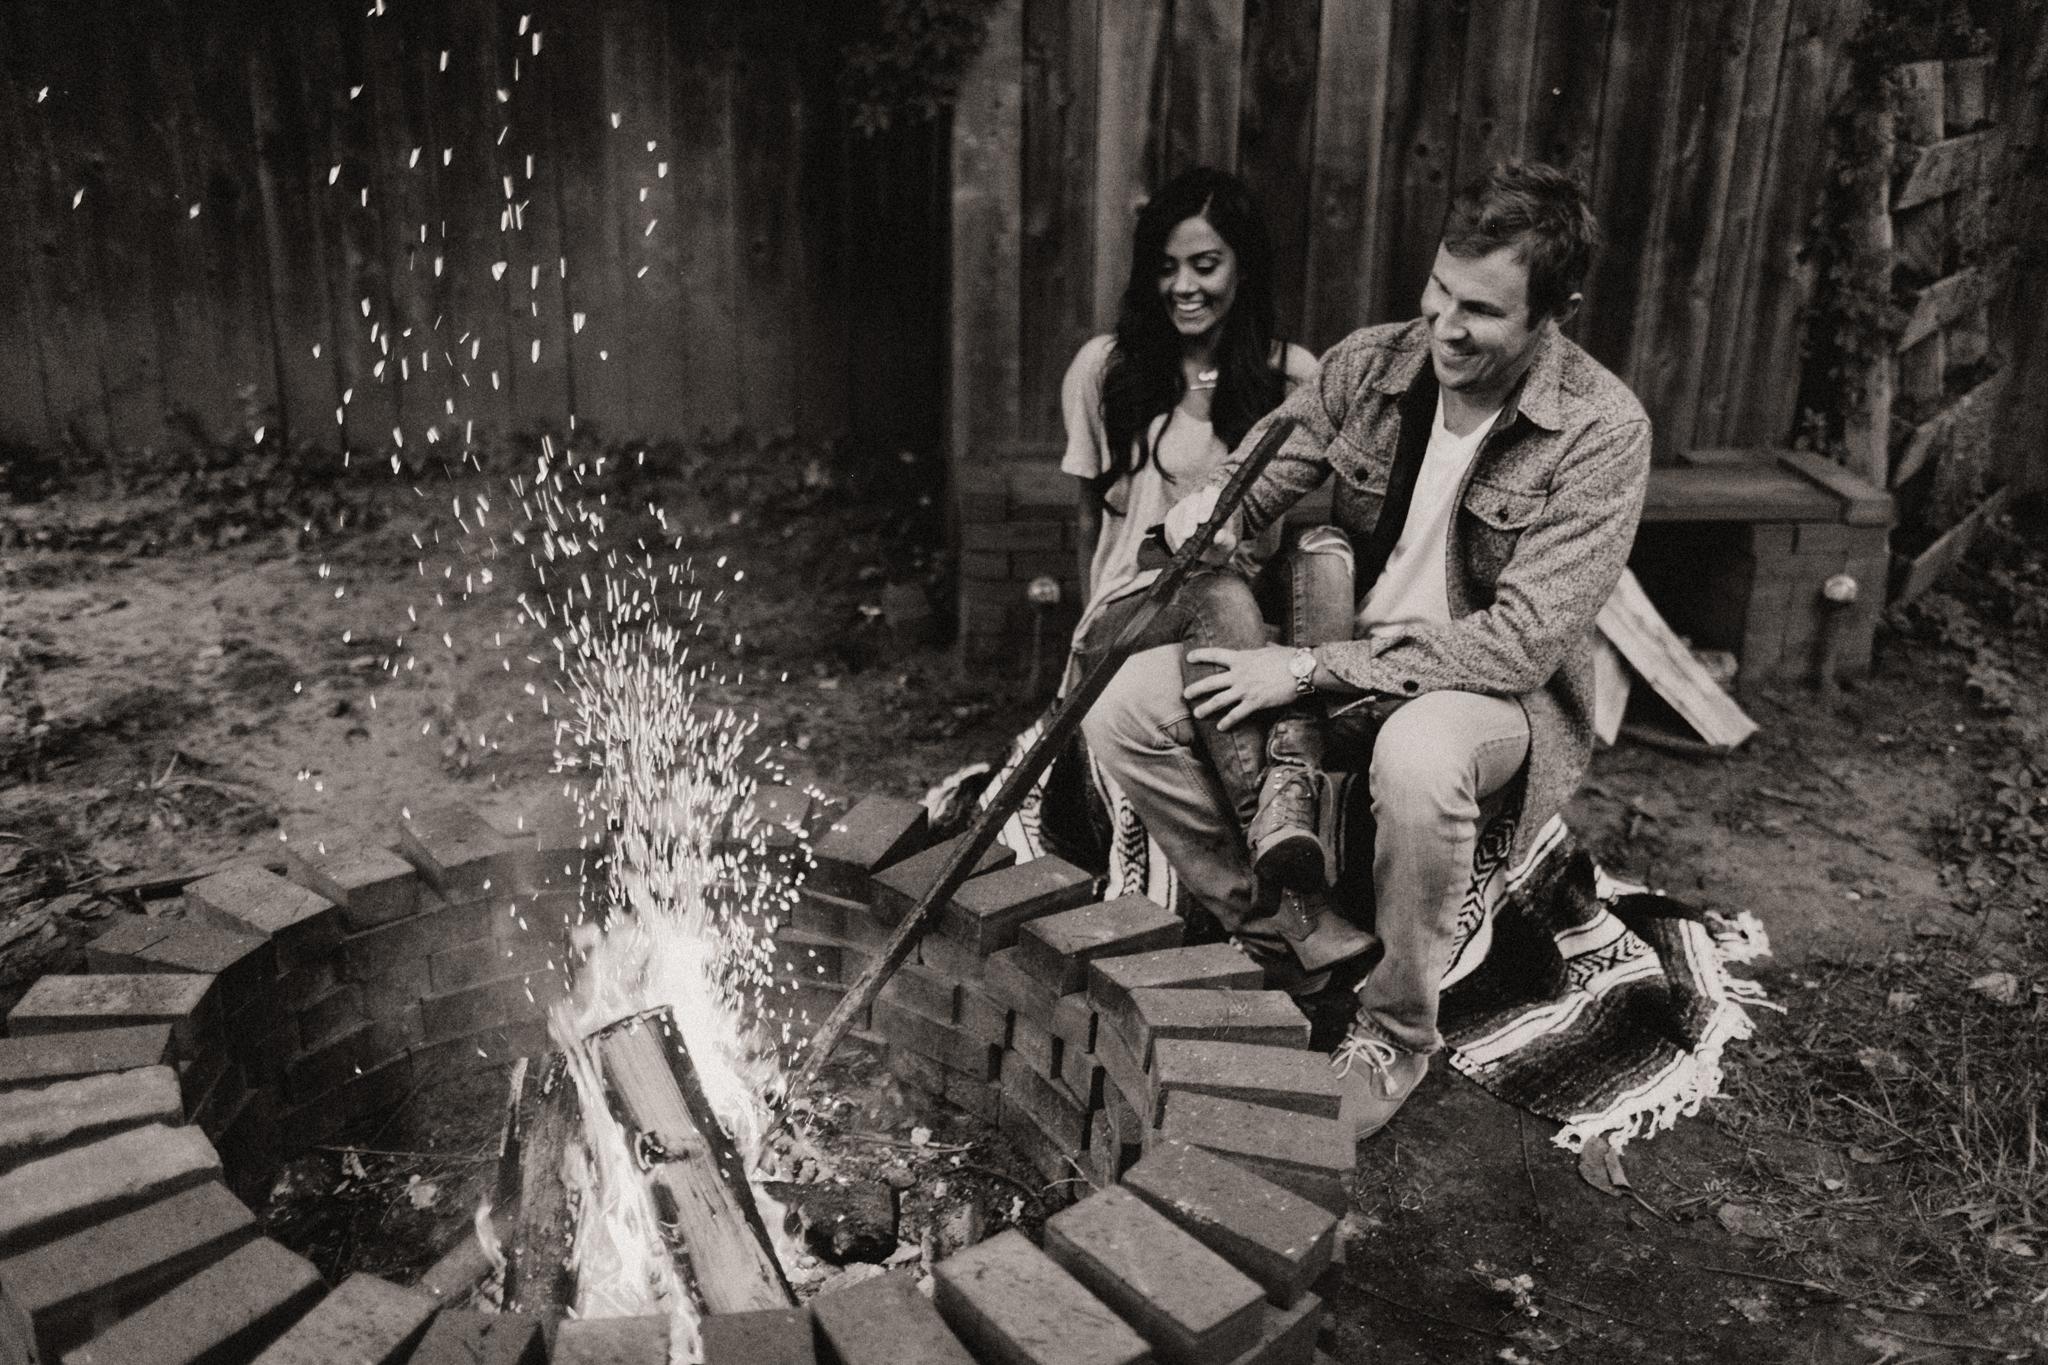 Melissa Marshall-Wichita Mountains Oklahoma Engagement_25a.jpg